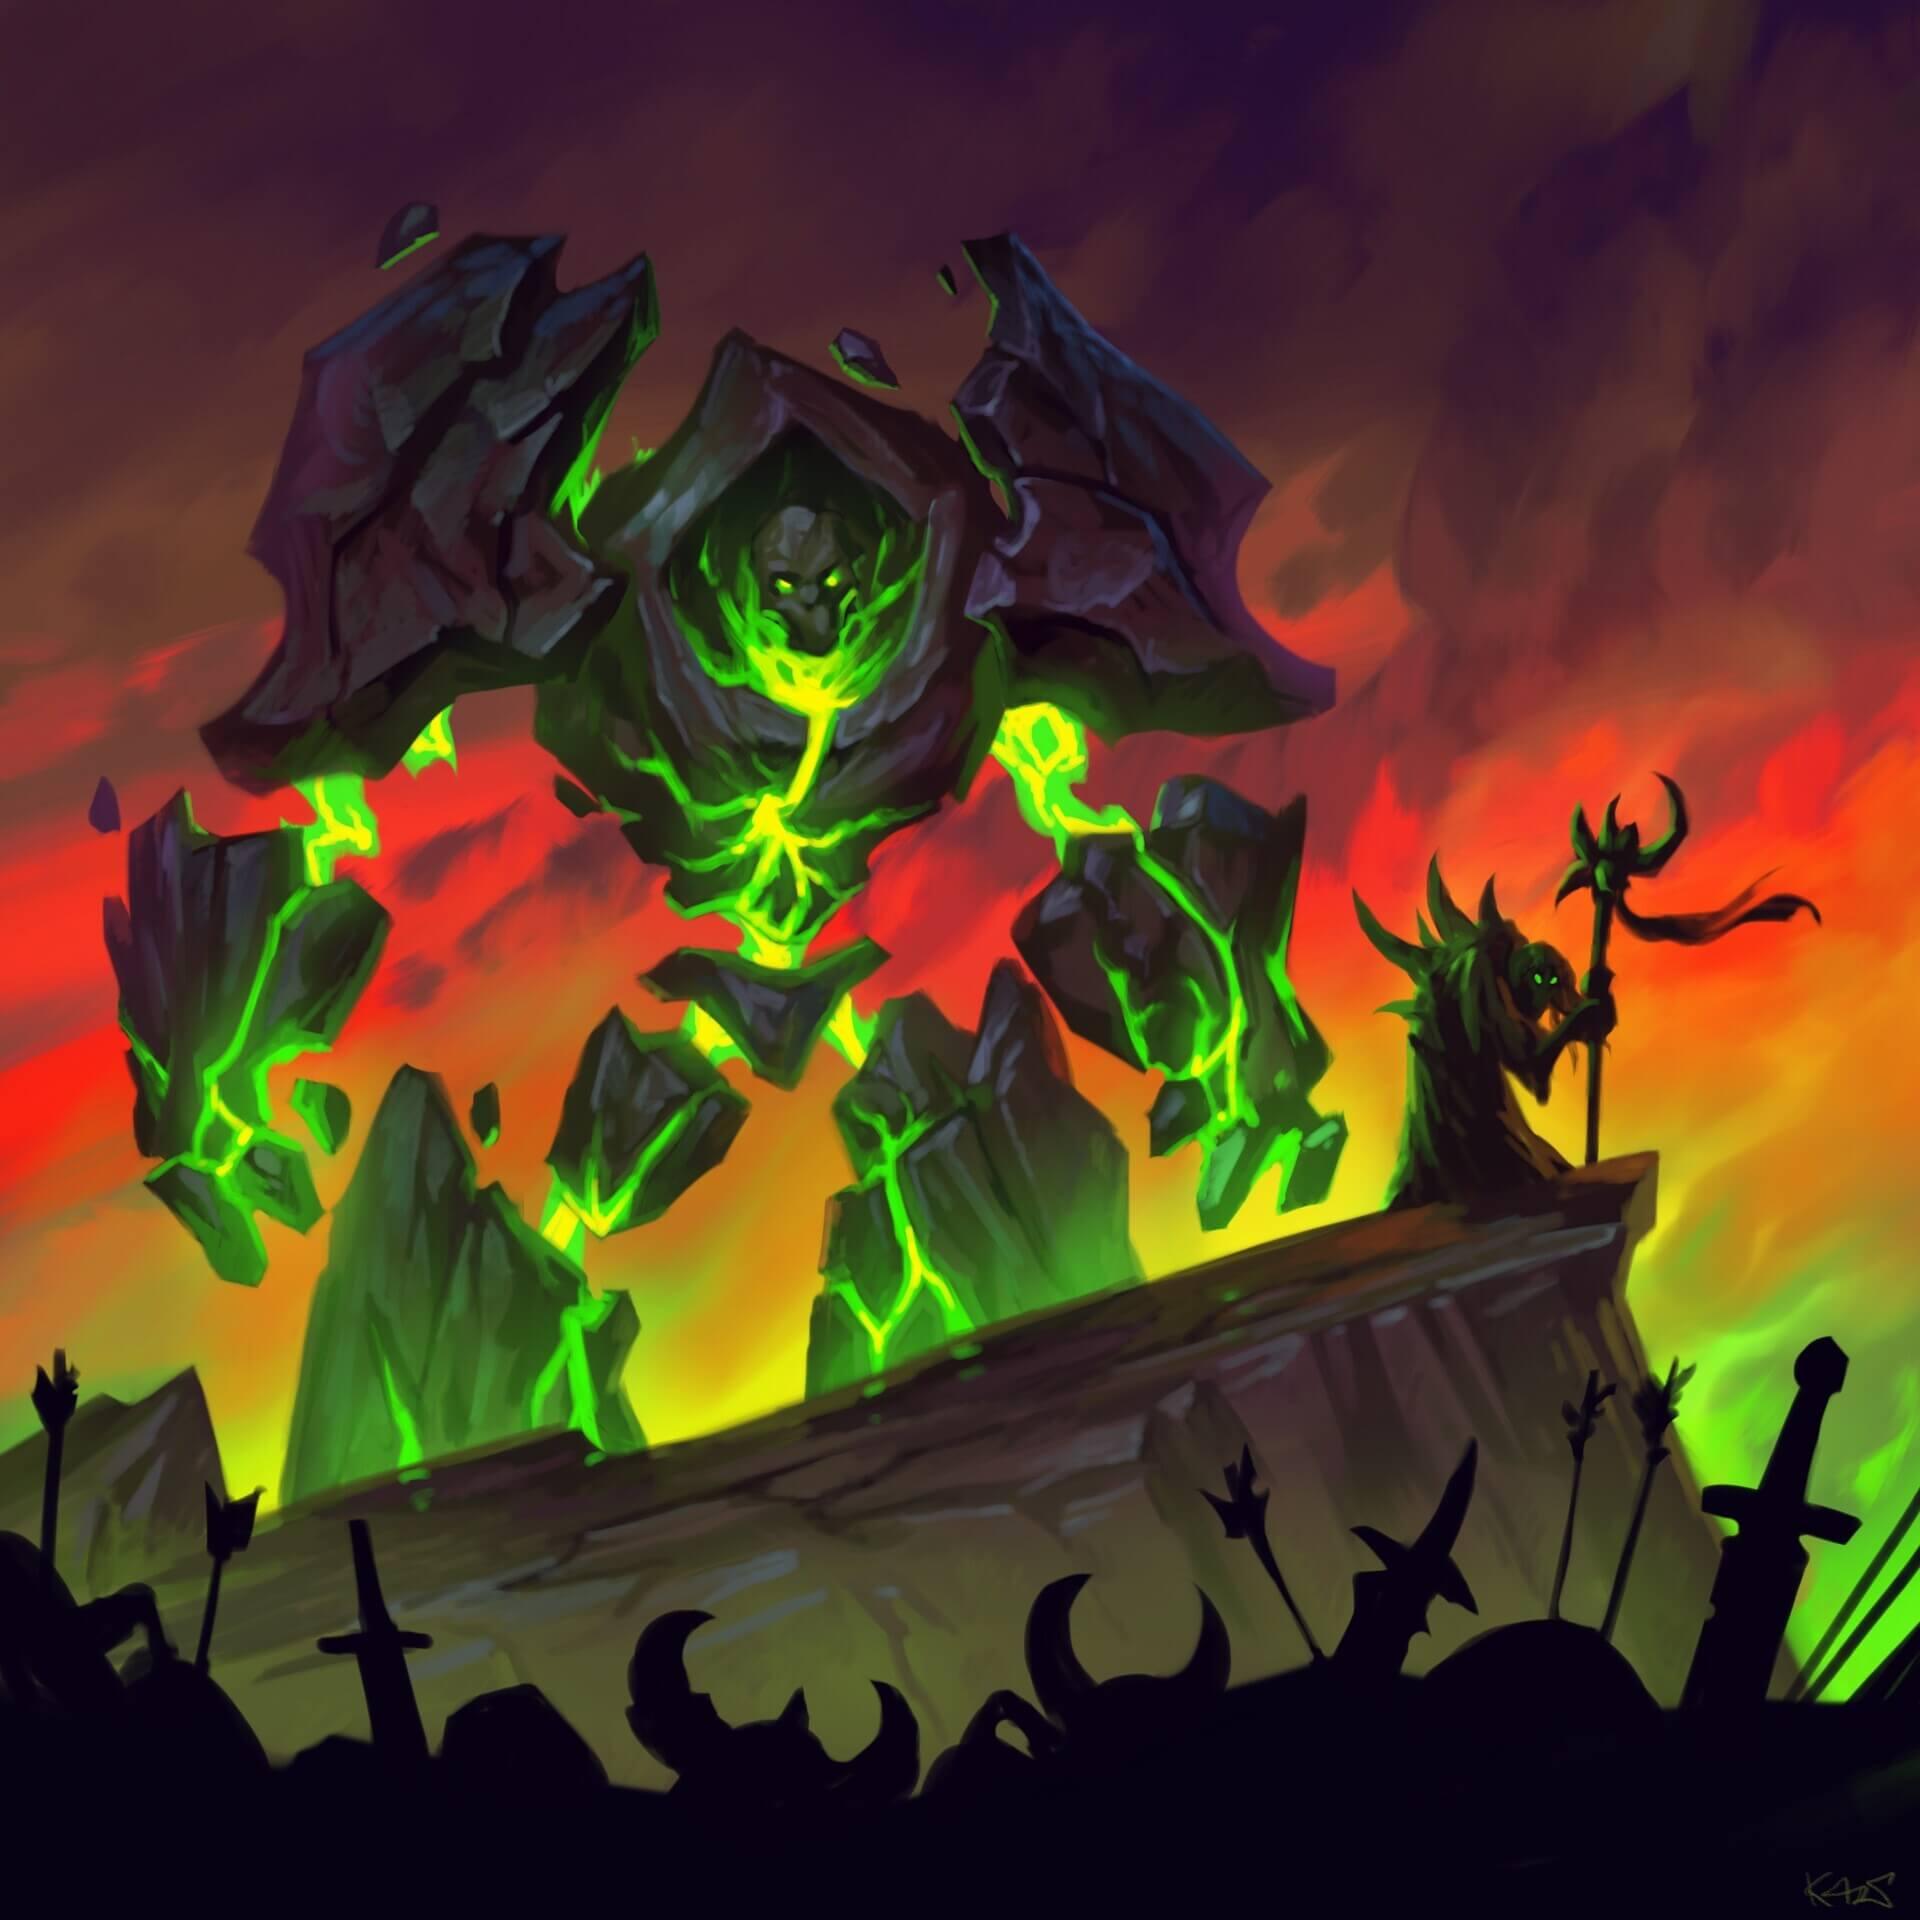 Turover warlock artwork